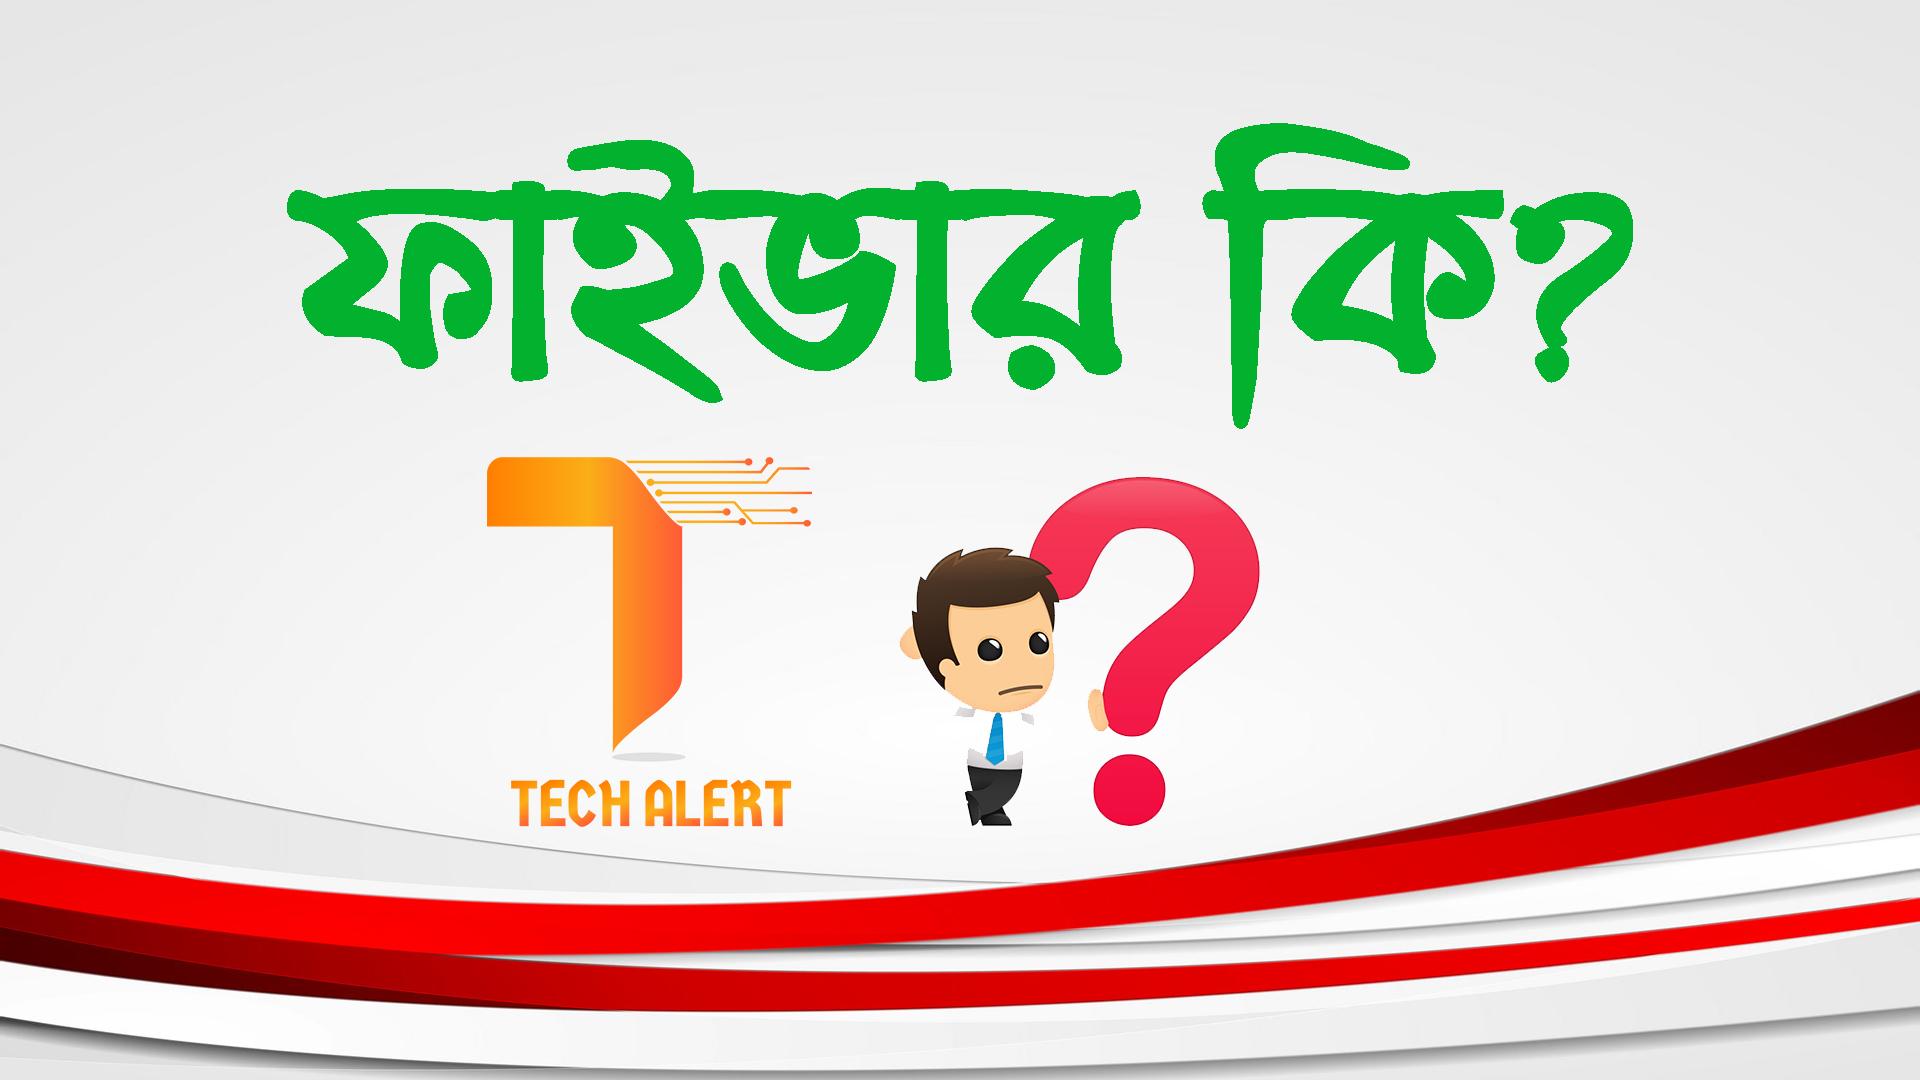 fiverr bangla tech alert